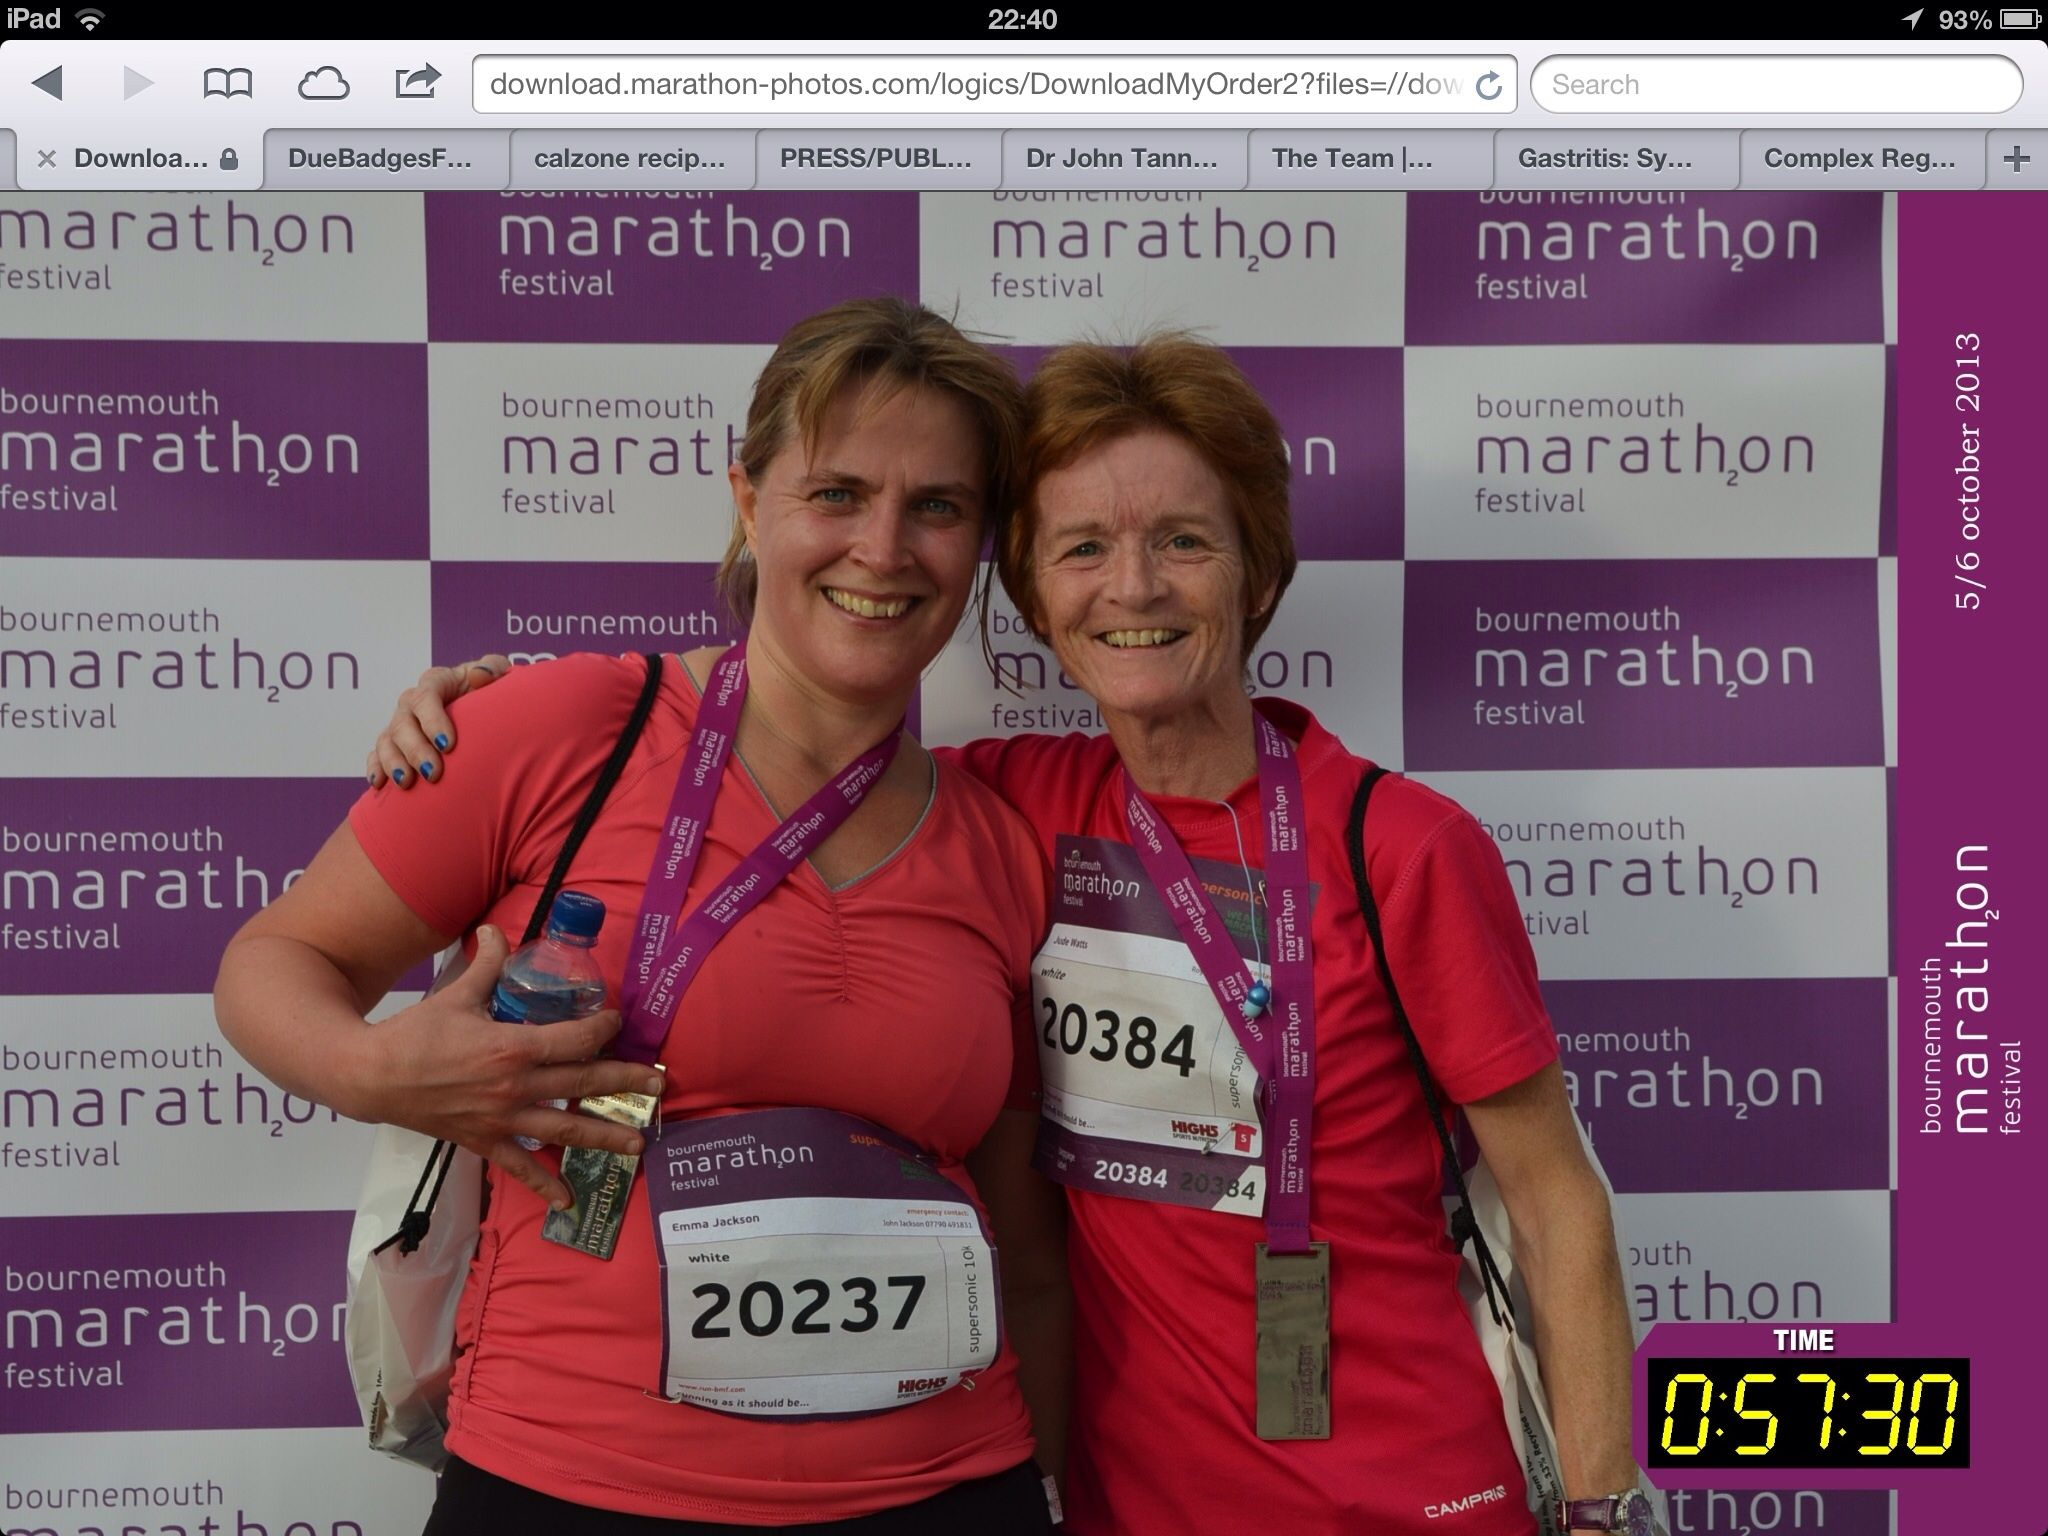 10k Bournemouth Marathon Festival